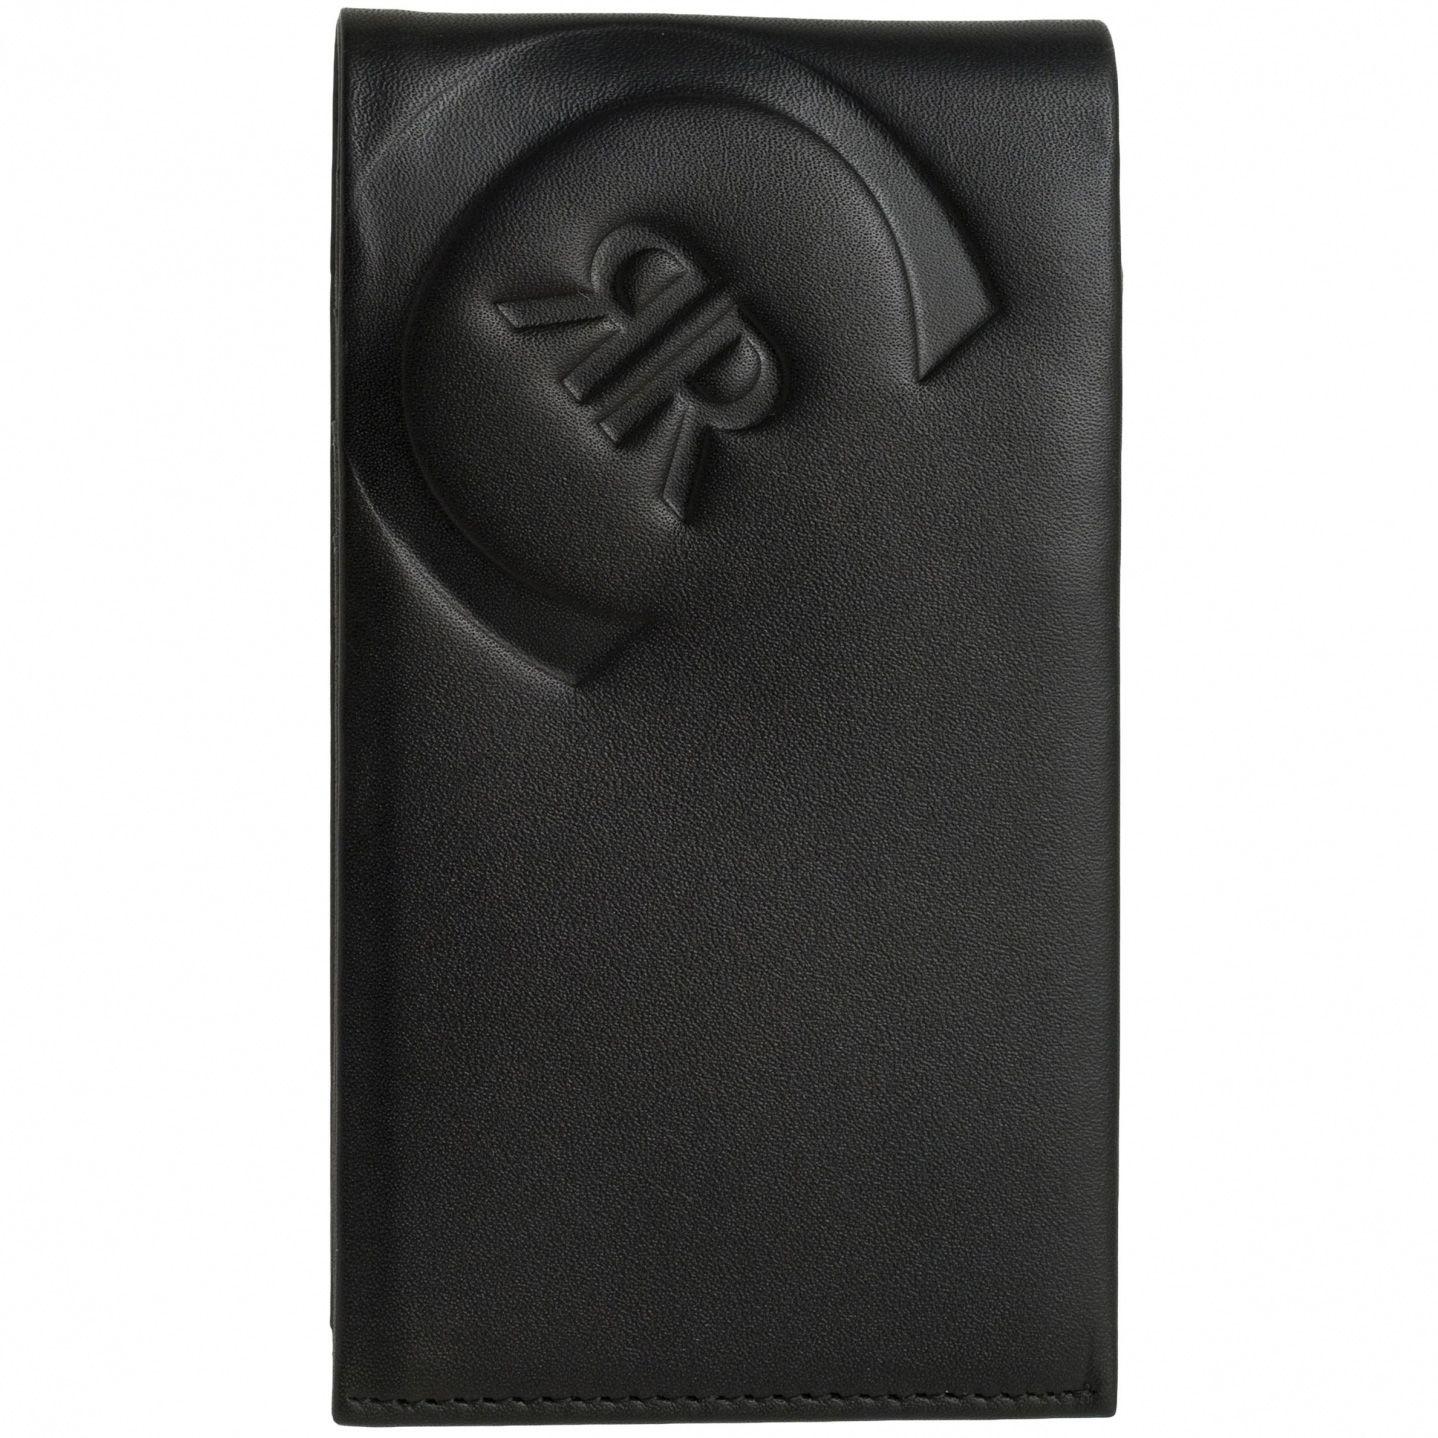 Набор Cerruti 1881 Label из футляра для карточек и футляра для флешки с карманом